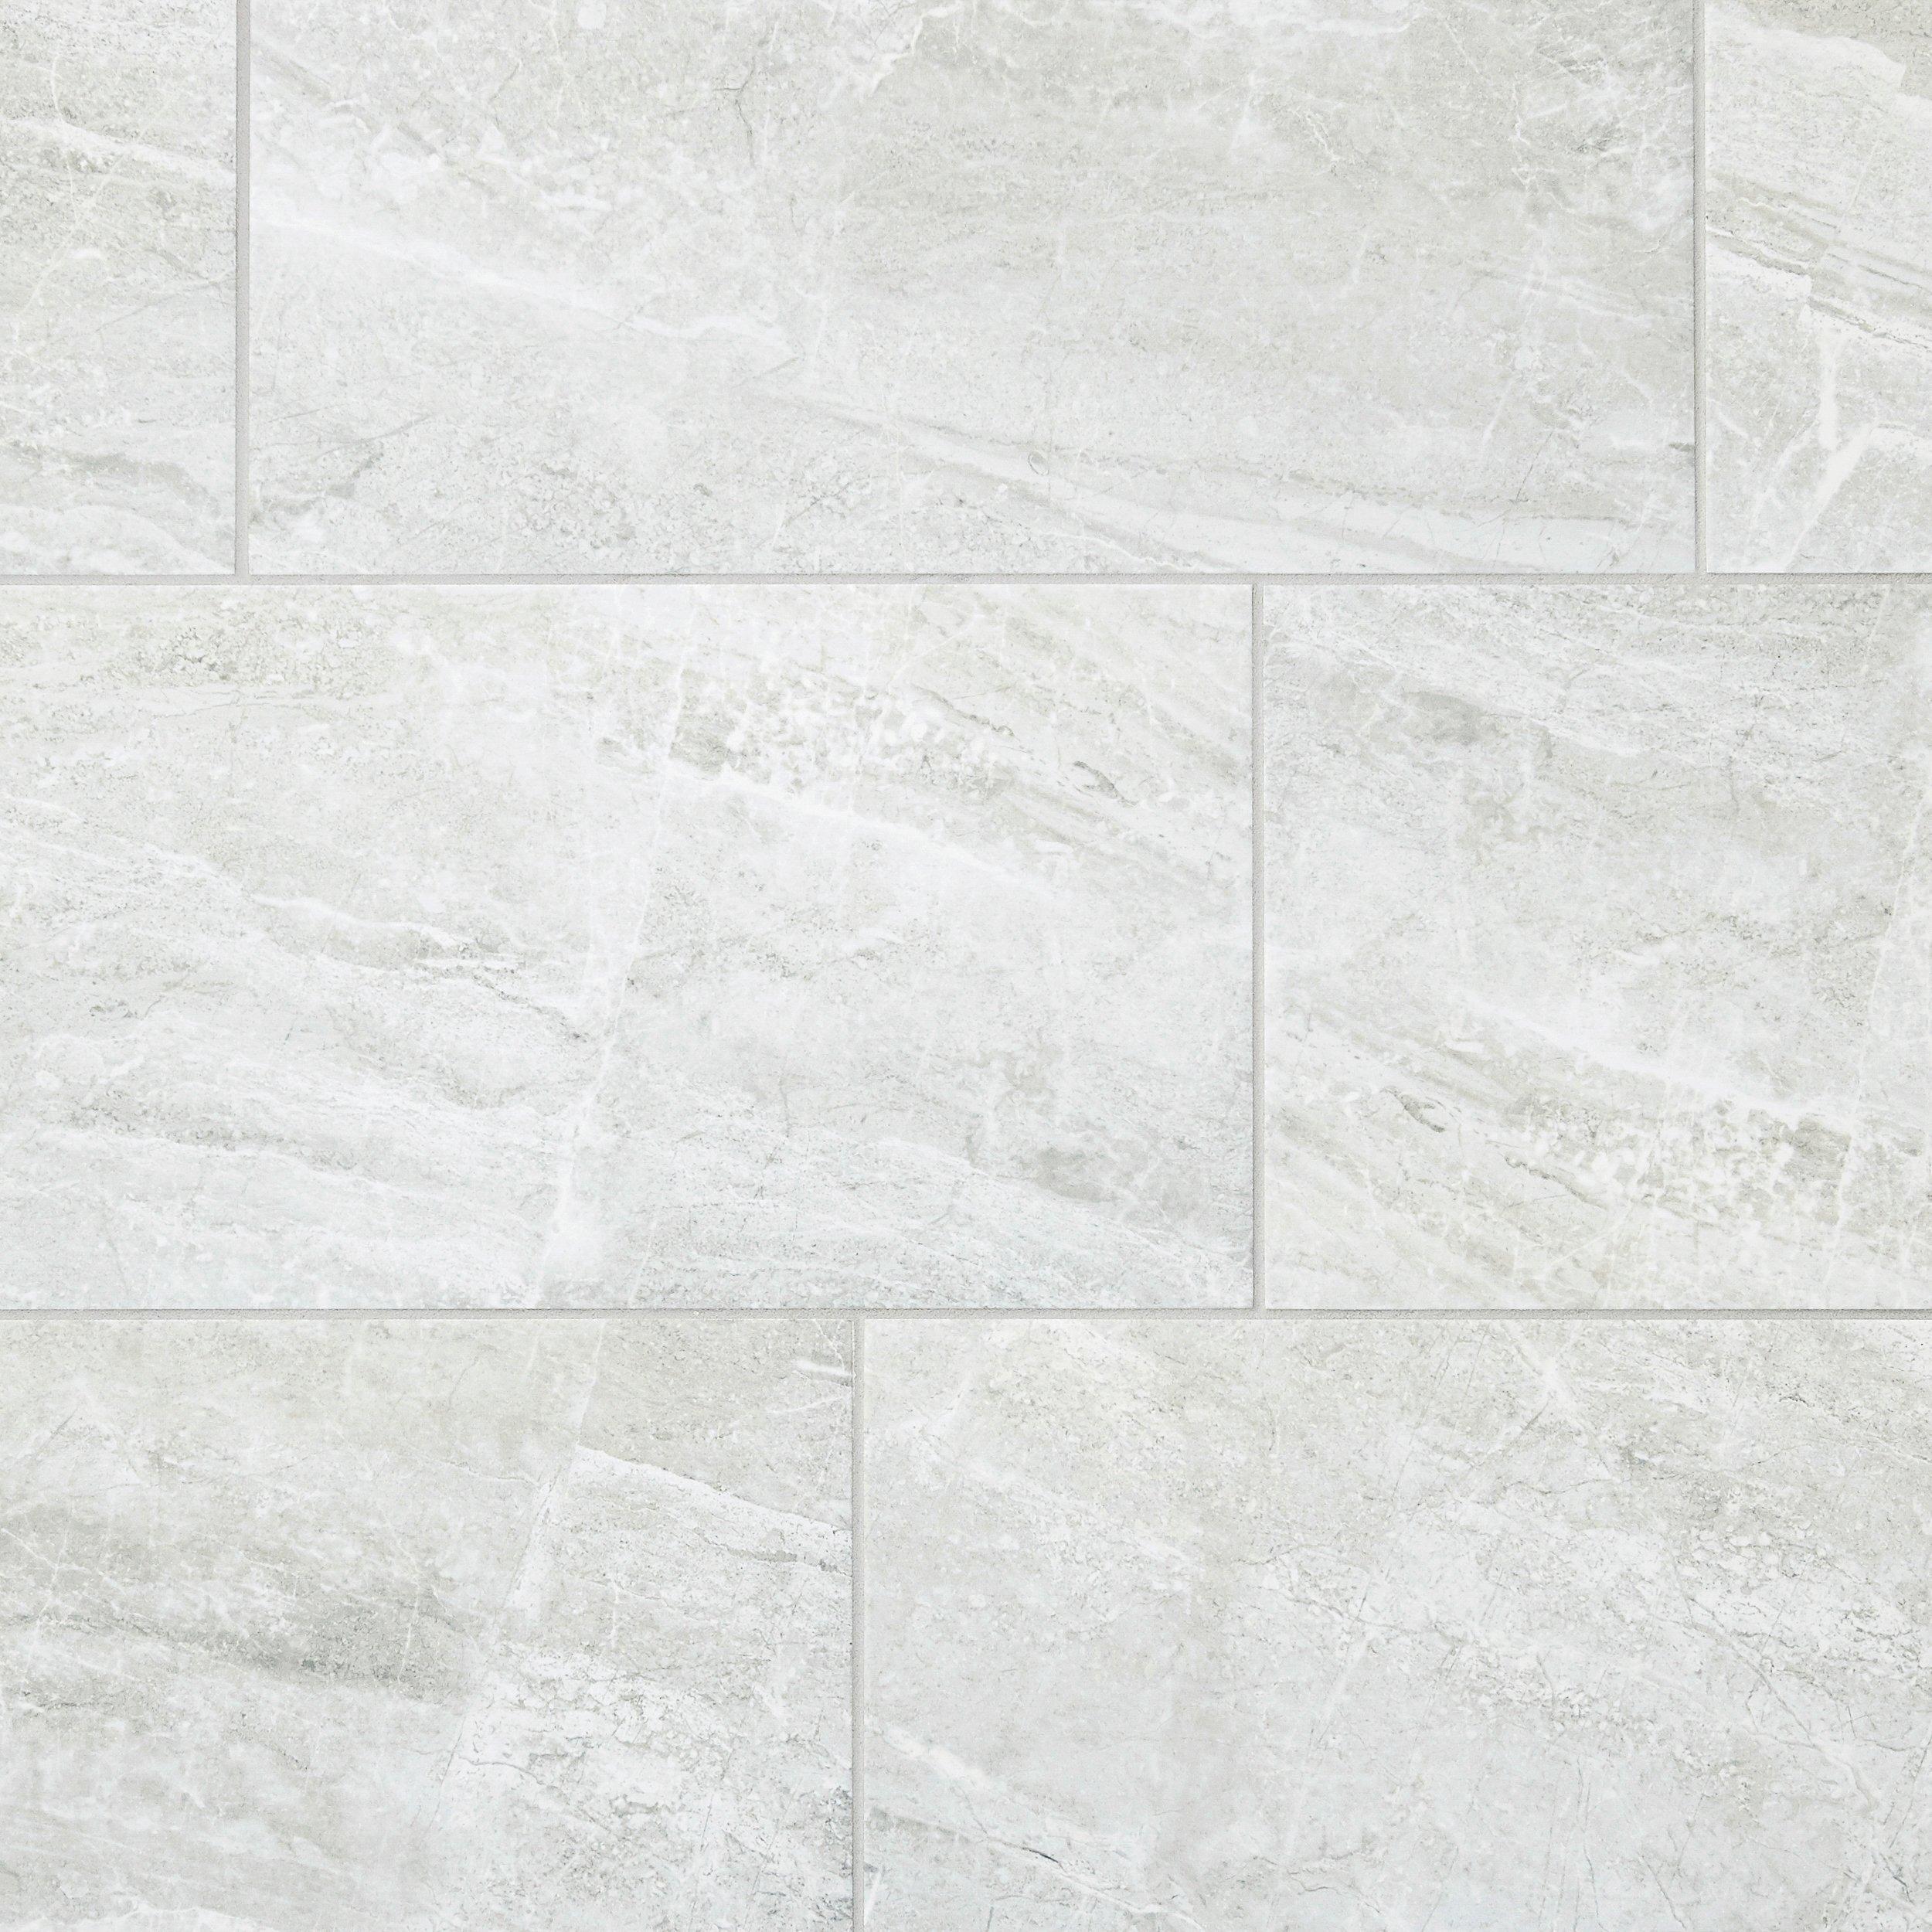 Porcelain Bathroom Floor Tiles: Floor & Decor